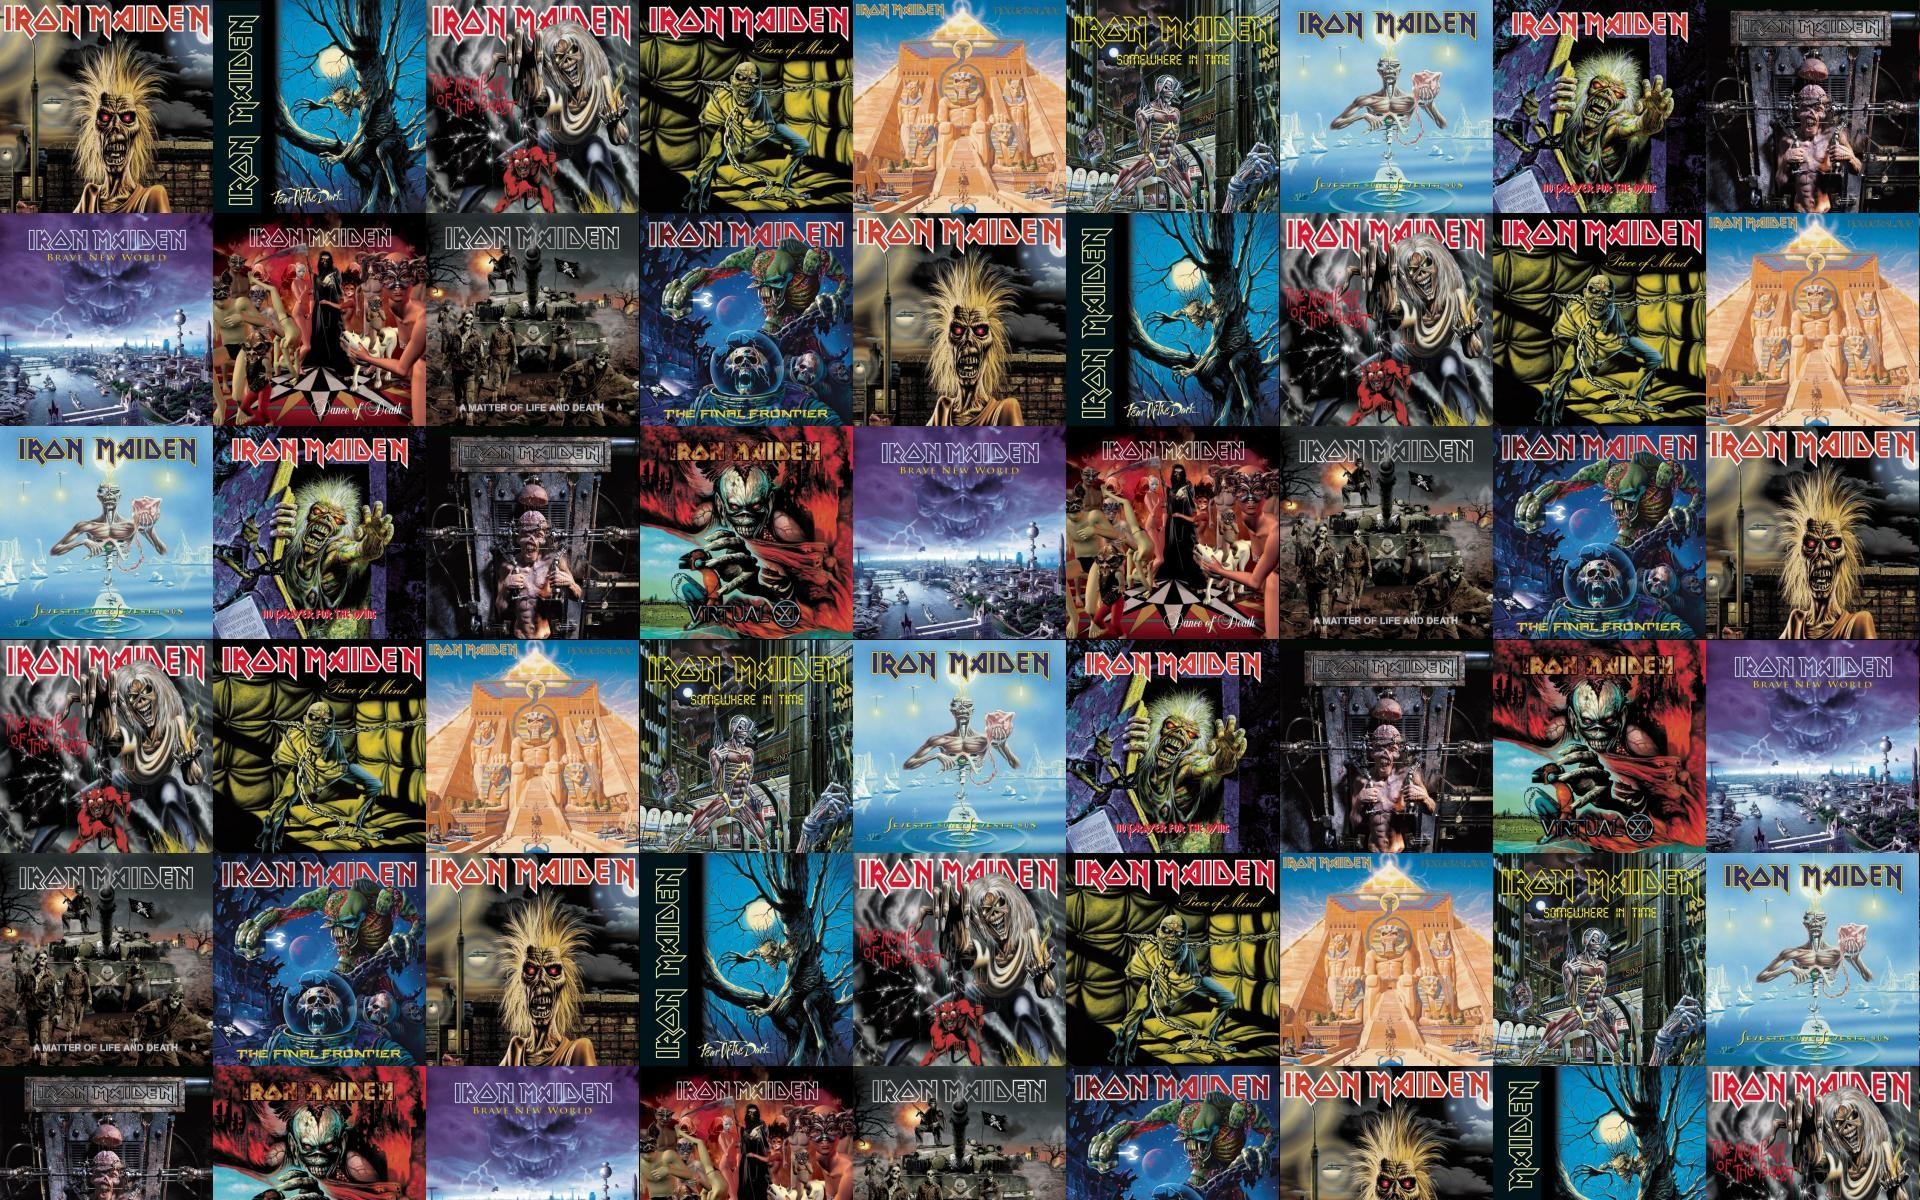 Iron Maiden Killers Fear Dark Number Beast Piece Wallpaper Â« Tiled Desktop  Wallpaper